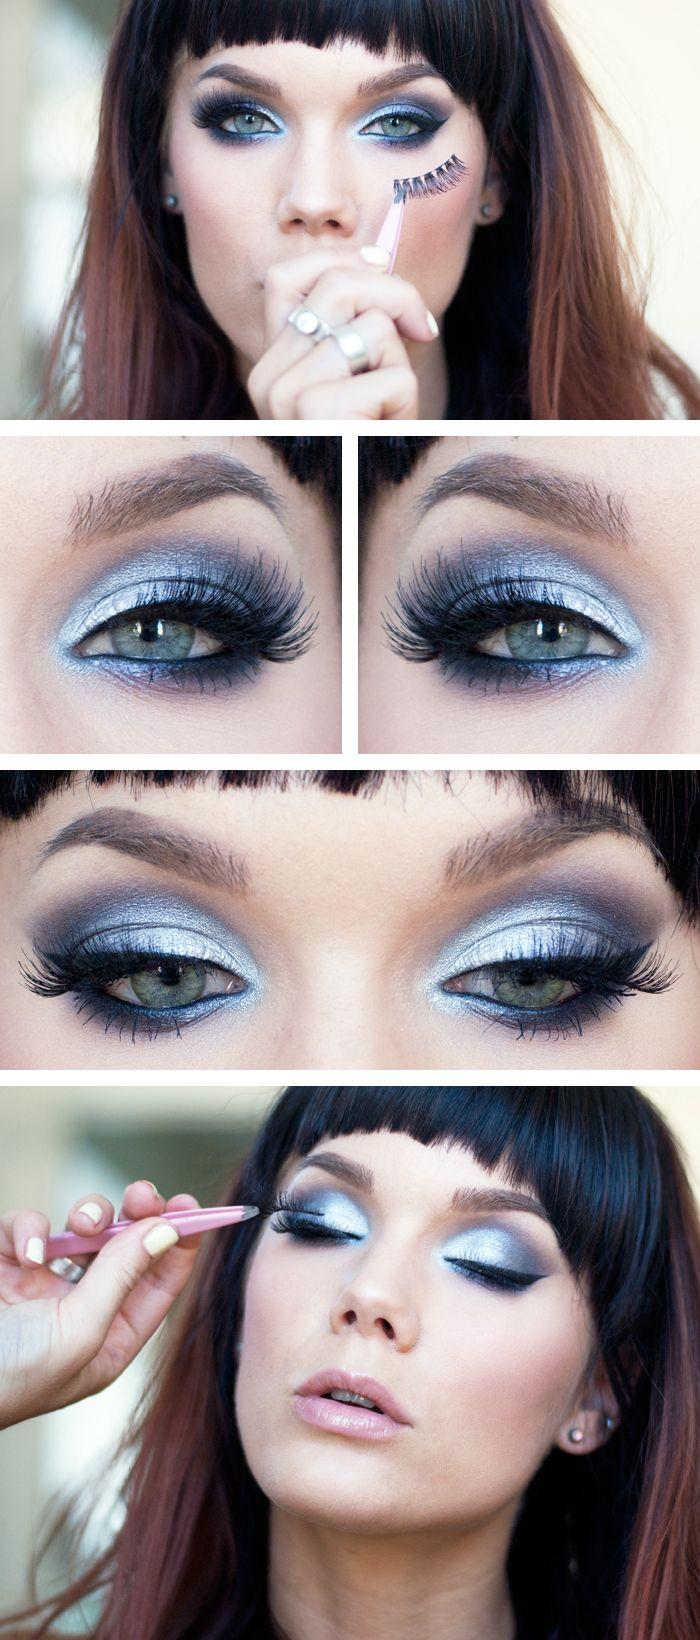 "-NYX HD eyeshadow base -Too faced Smokey eye -MAC Kohl power Eye pencil Feline -MUS Long lash mascara -NARS Eyeliner stylo Carpates -House of lashes ""Siren"""